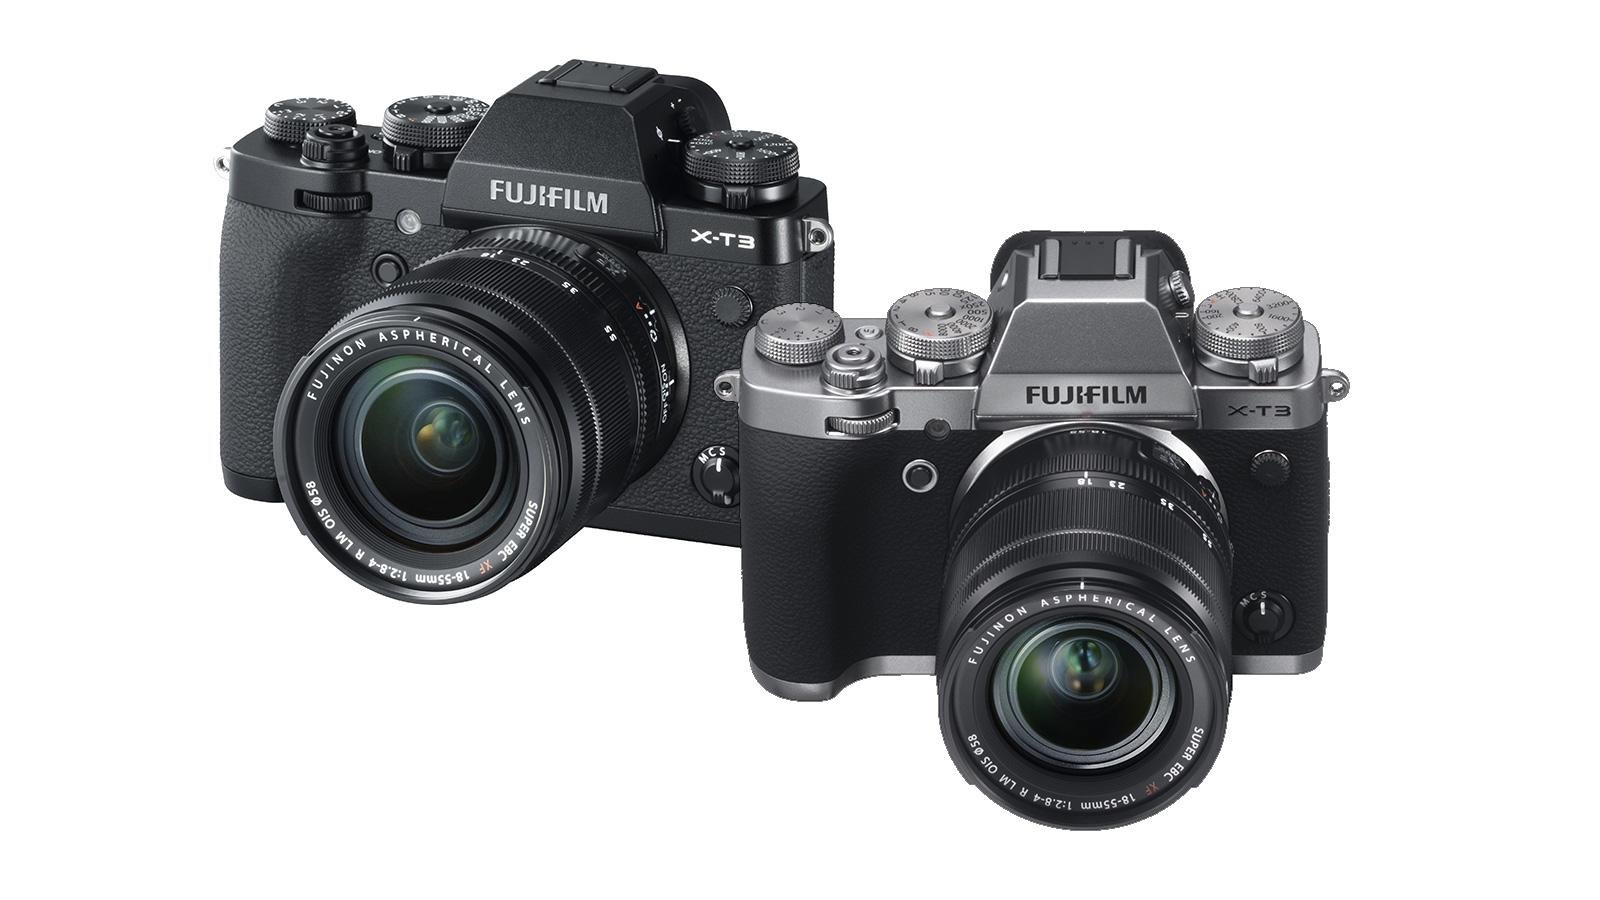 Fujifilm Announces X-T3 with 26.1MP X-Trans 4 Sensor